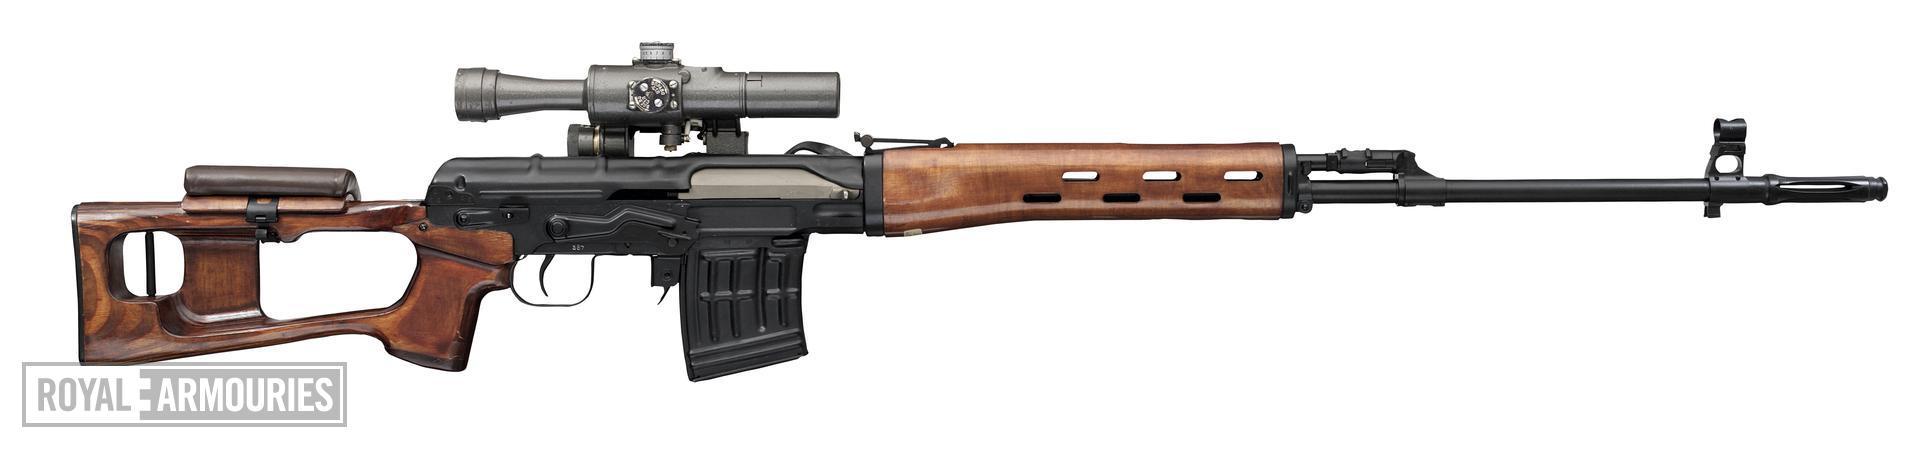 Centrefire self-loading rifle - Dragunov SVD